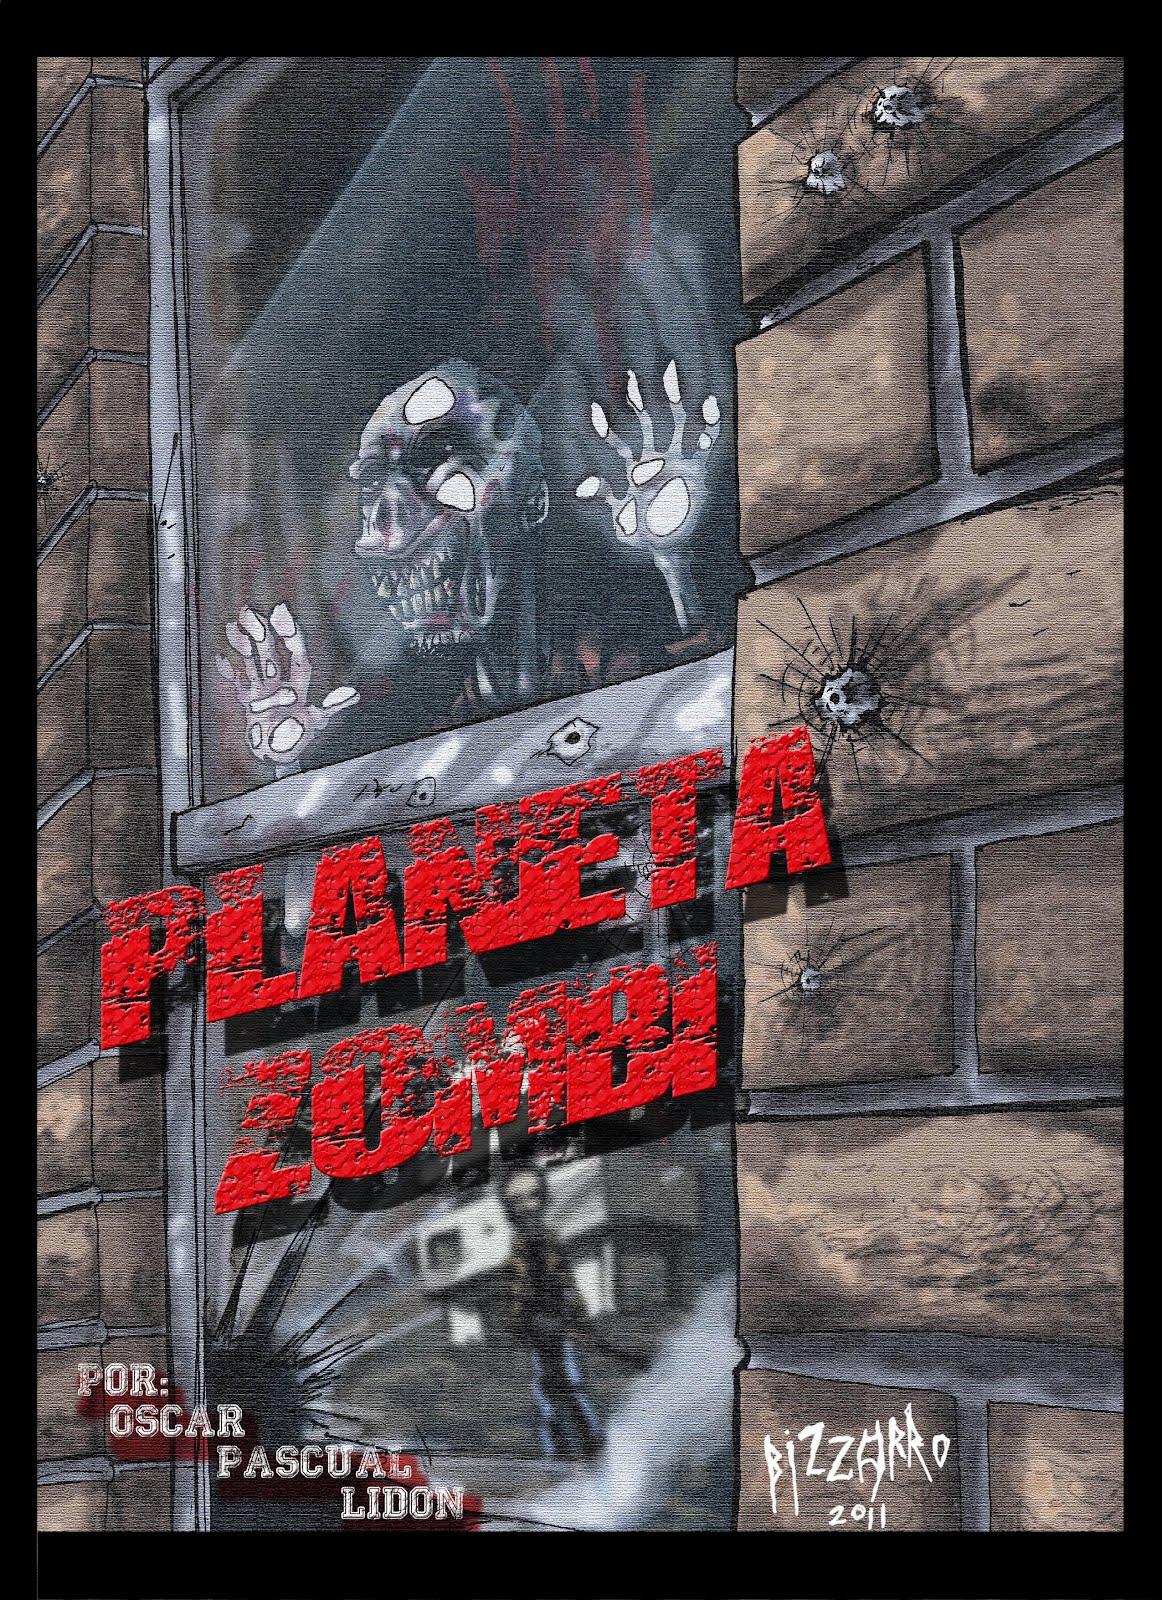 Planeta Zombi